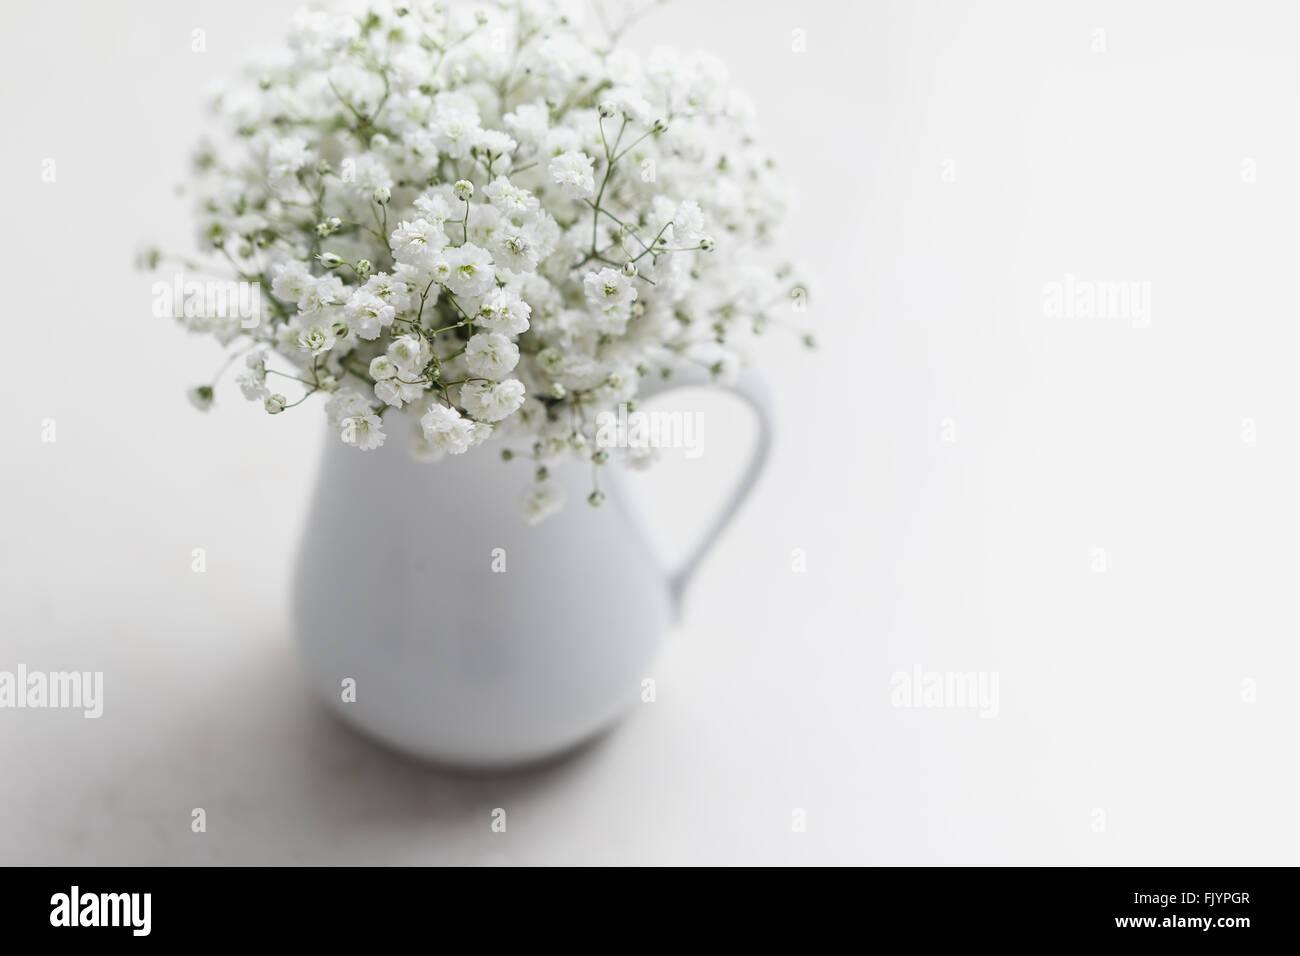 White baby's breath flowers (Gypsophila) in white vase - Stock Image